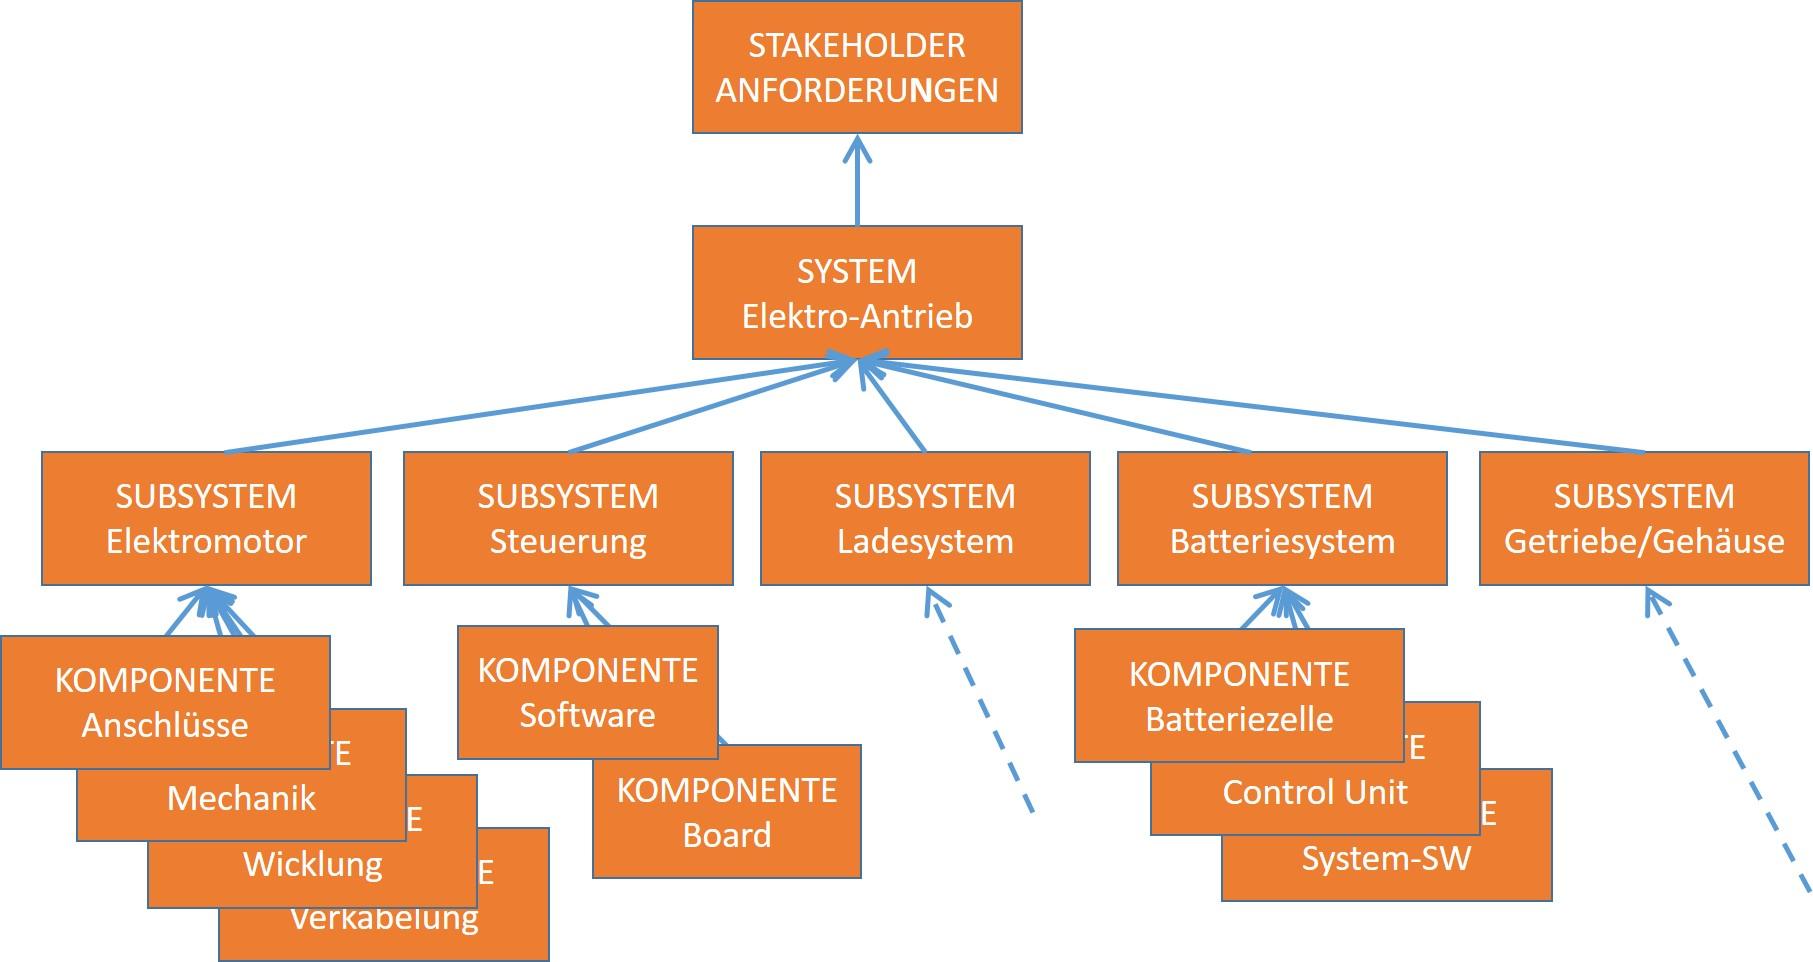 Abb. 2: Informationsmodell mit System-Dekomposition